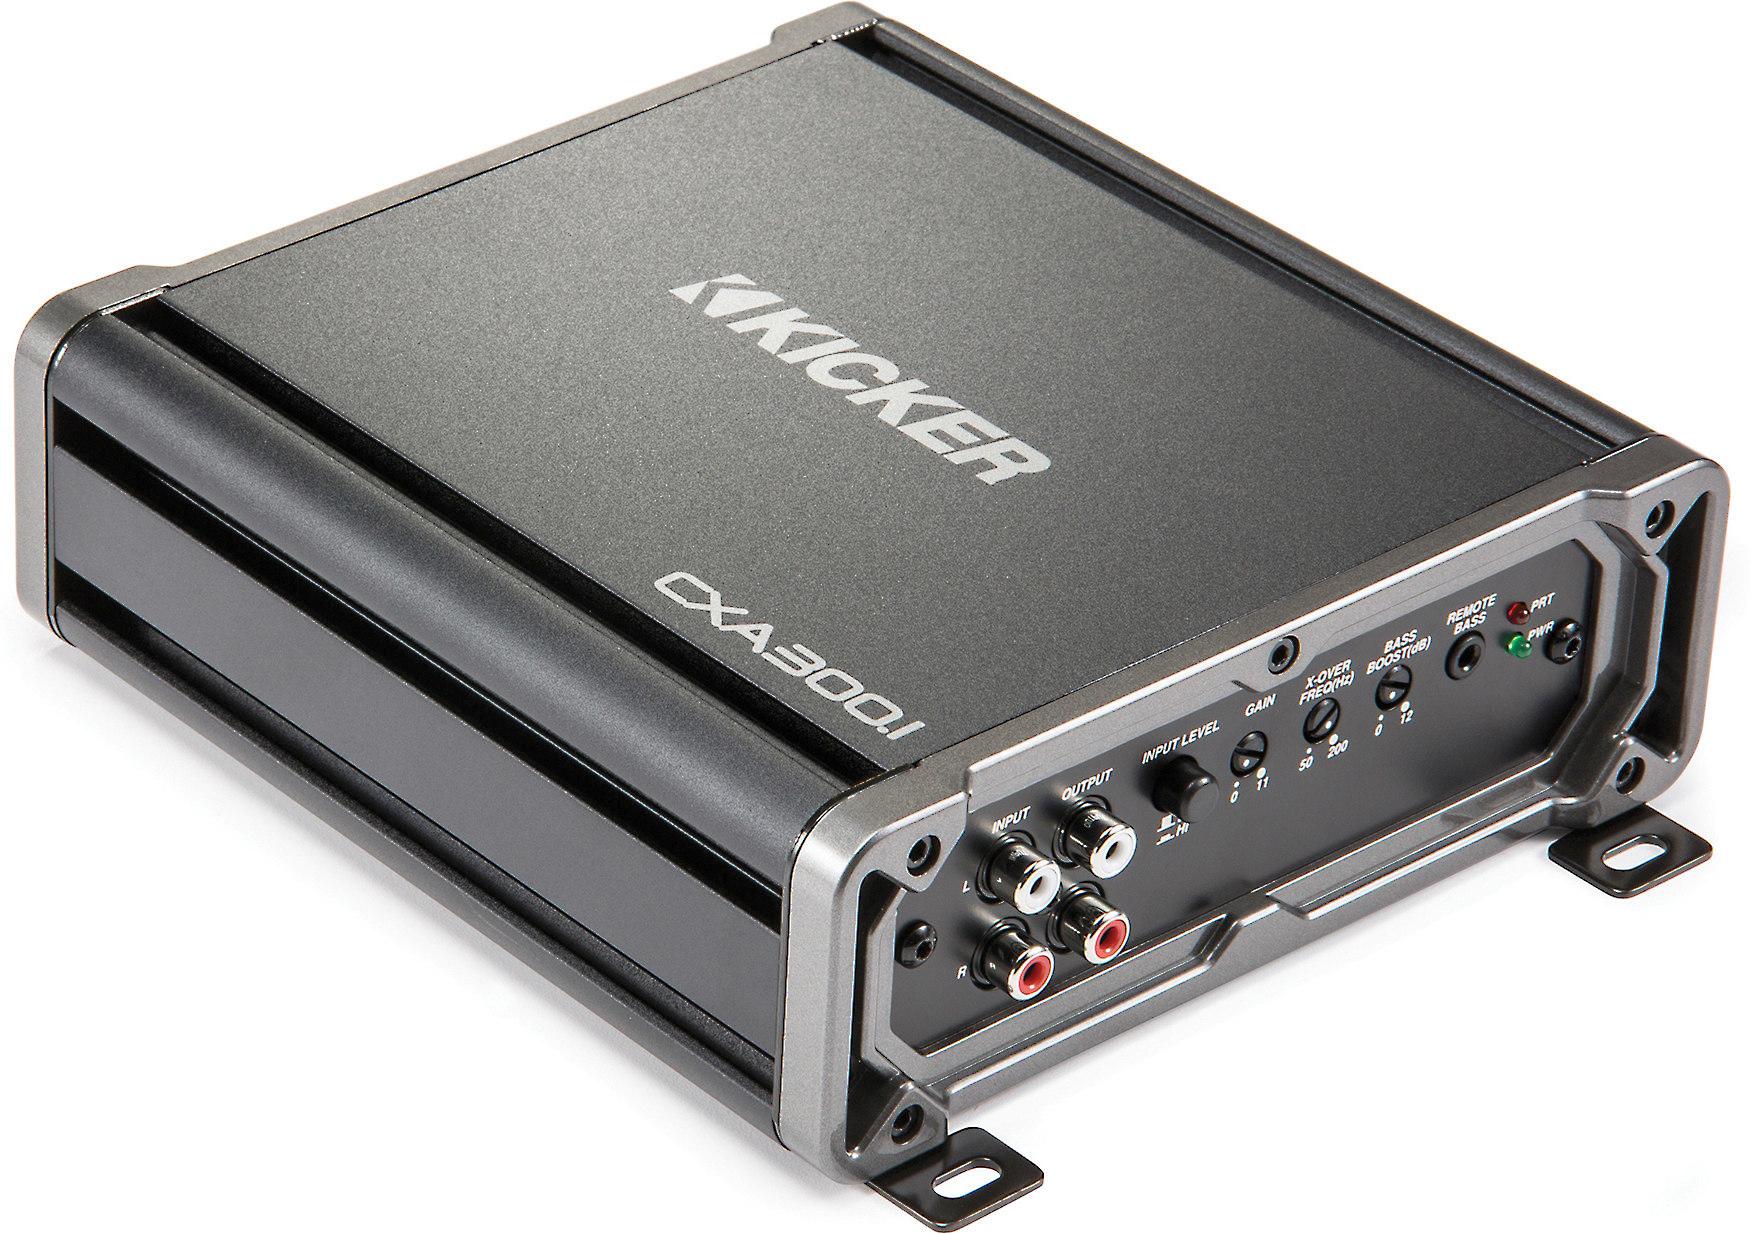 hight resolution of kicker 43cxa300 1 cx series mono subwoofer amplifier 300 watts rms x 1 at 2 ohms at crutchfield com